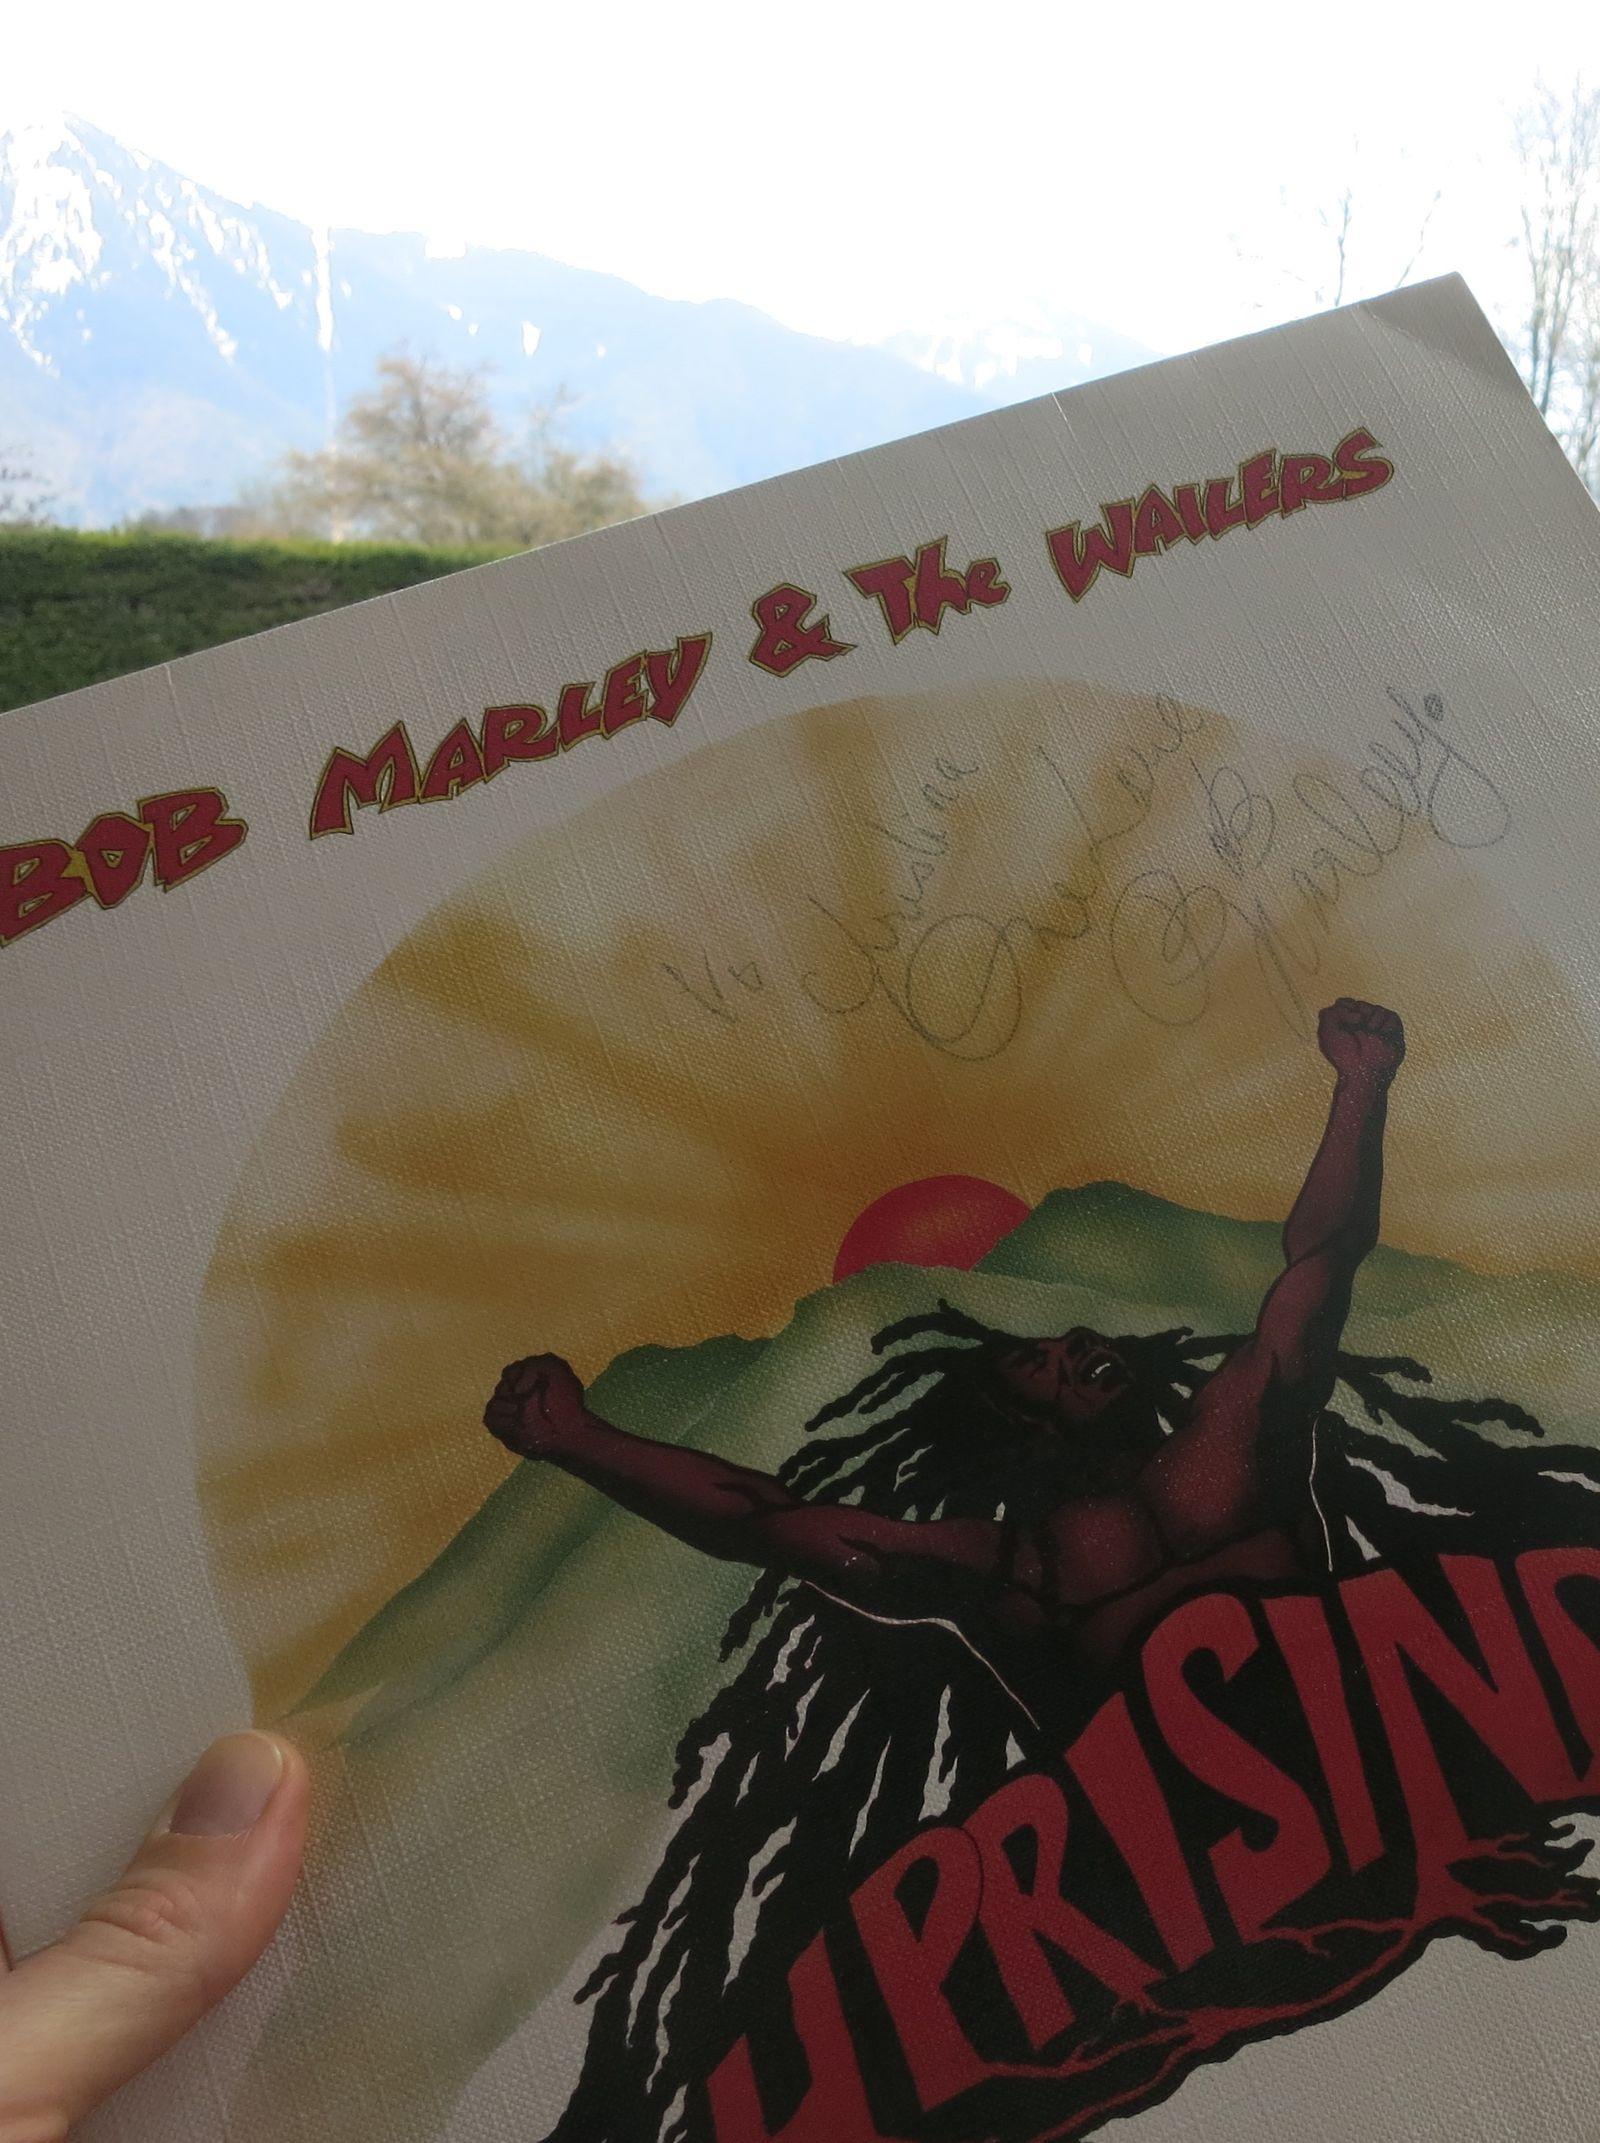 To Christina One Love Bob Marley Signiertes Uprising-Album ©Stephan Kroener zugeschnitten